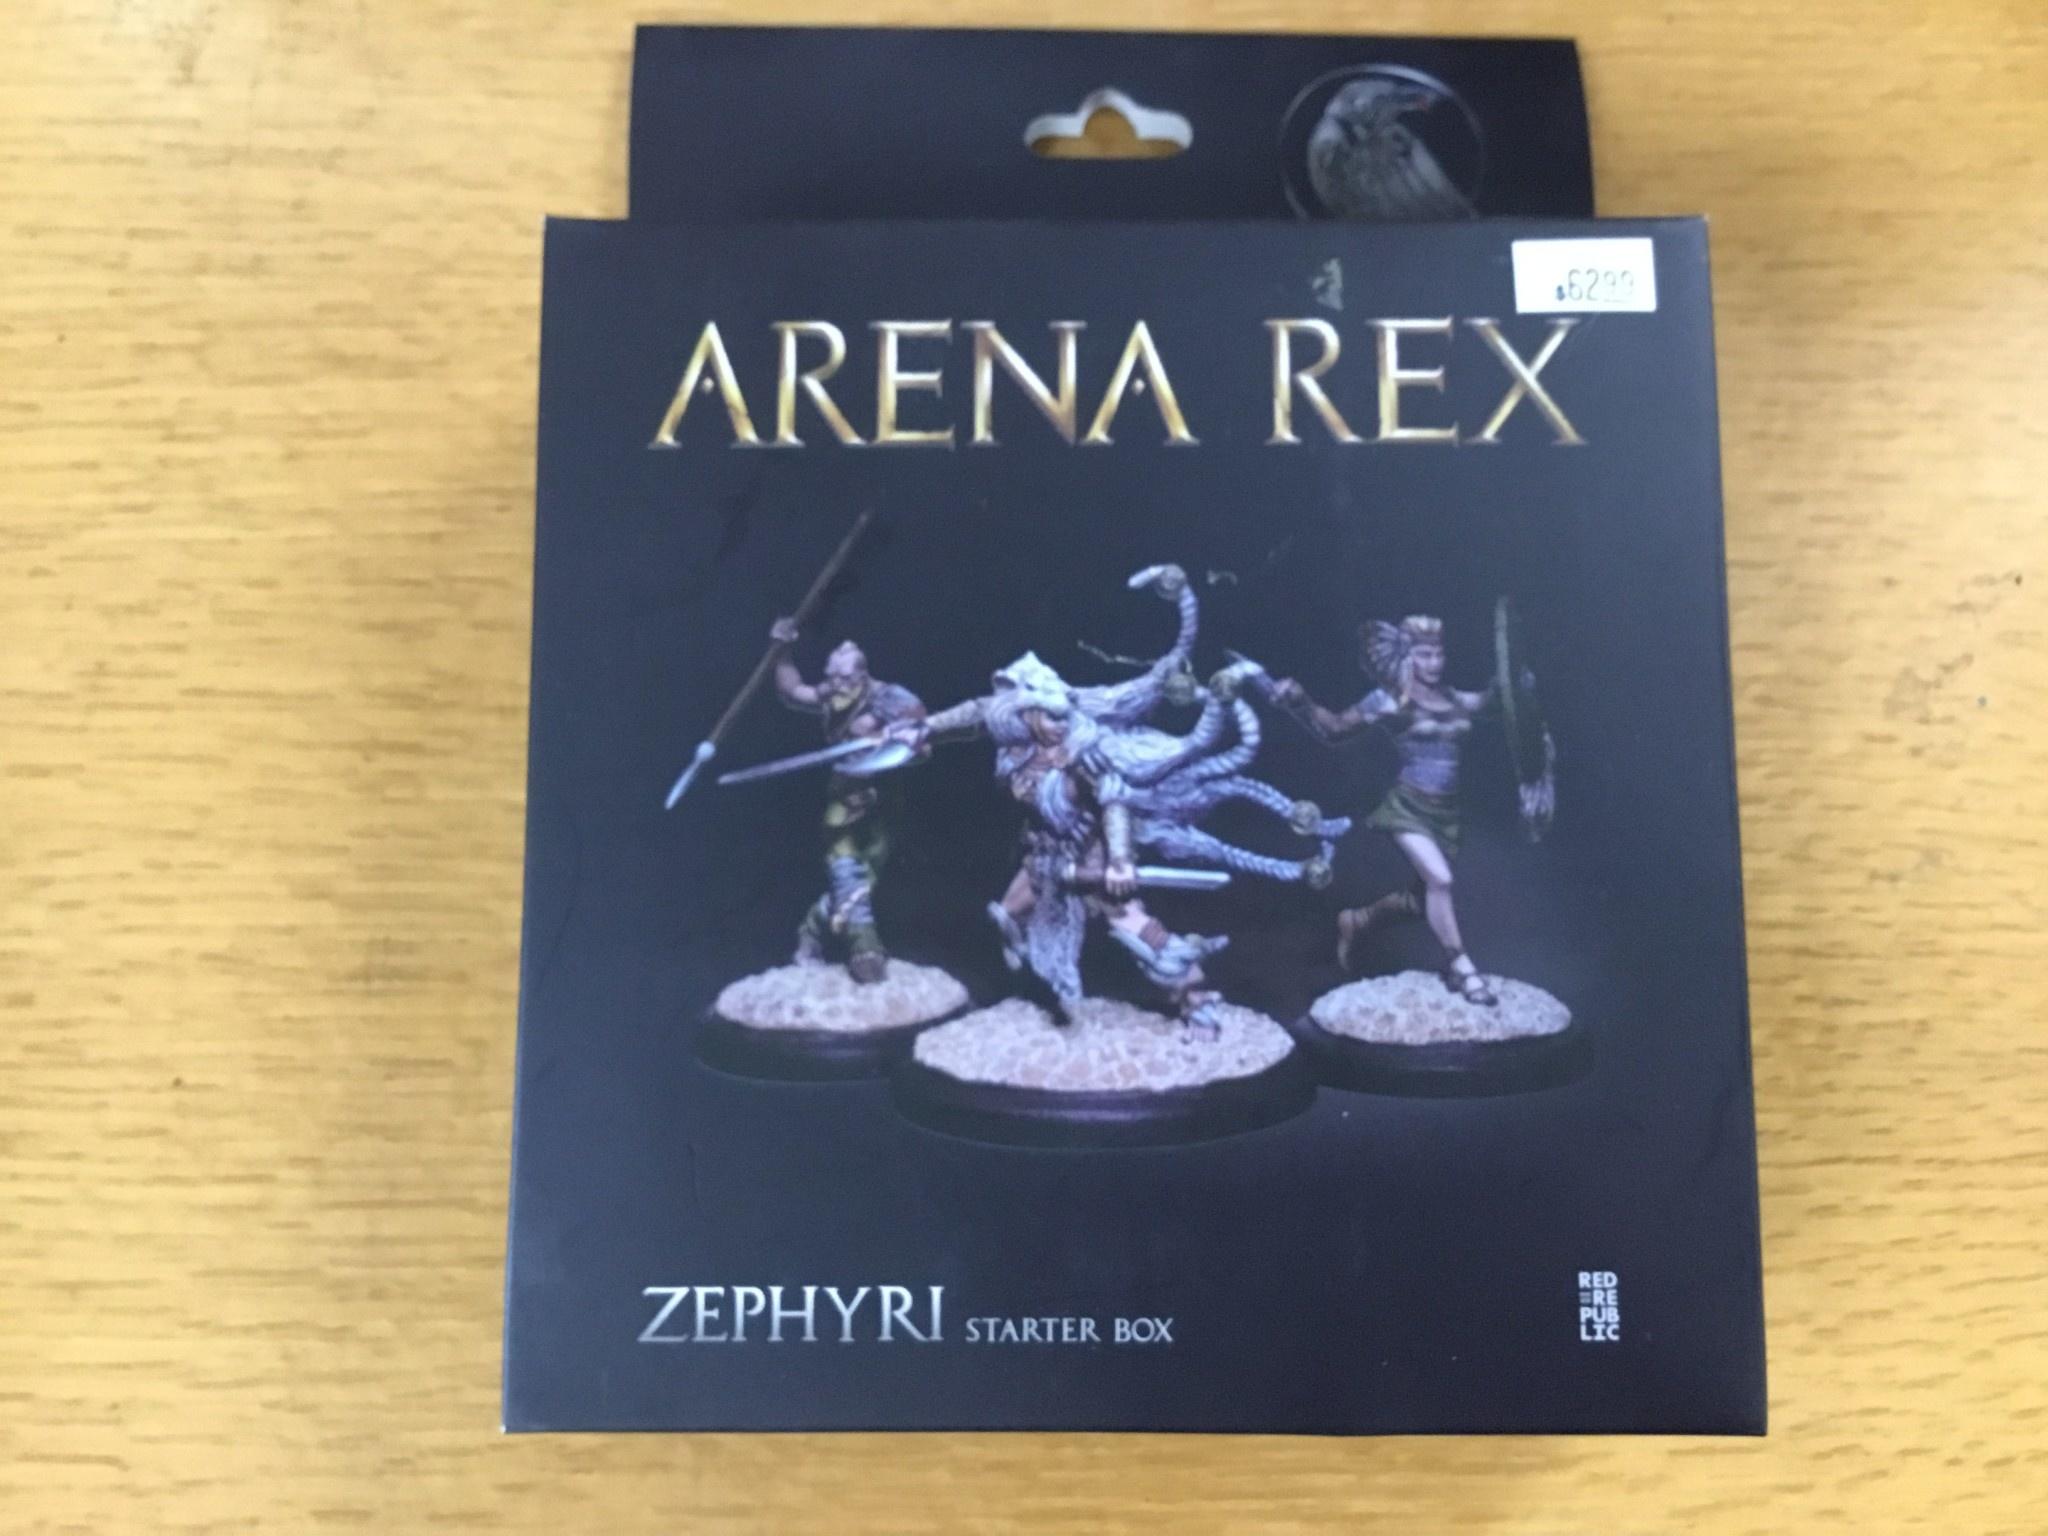 Red republic Arena Rex: Zephyri Starter Box